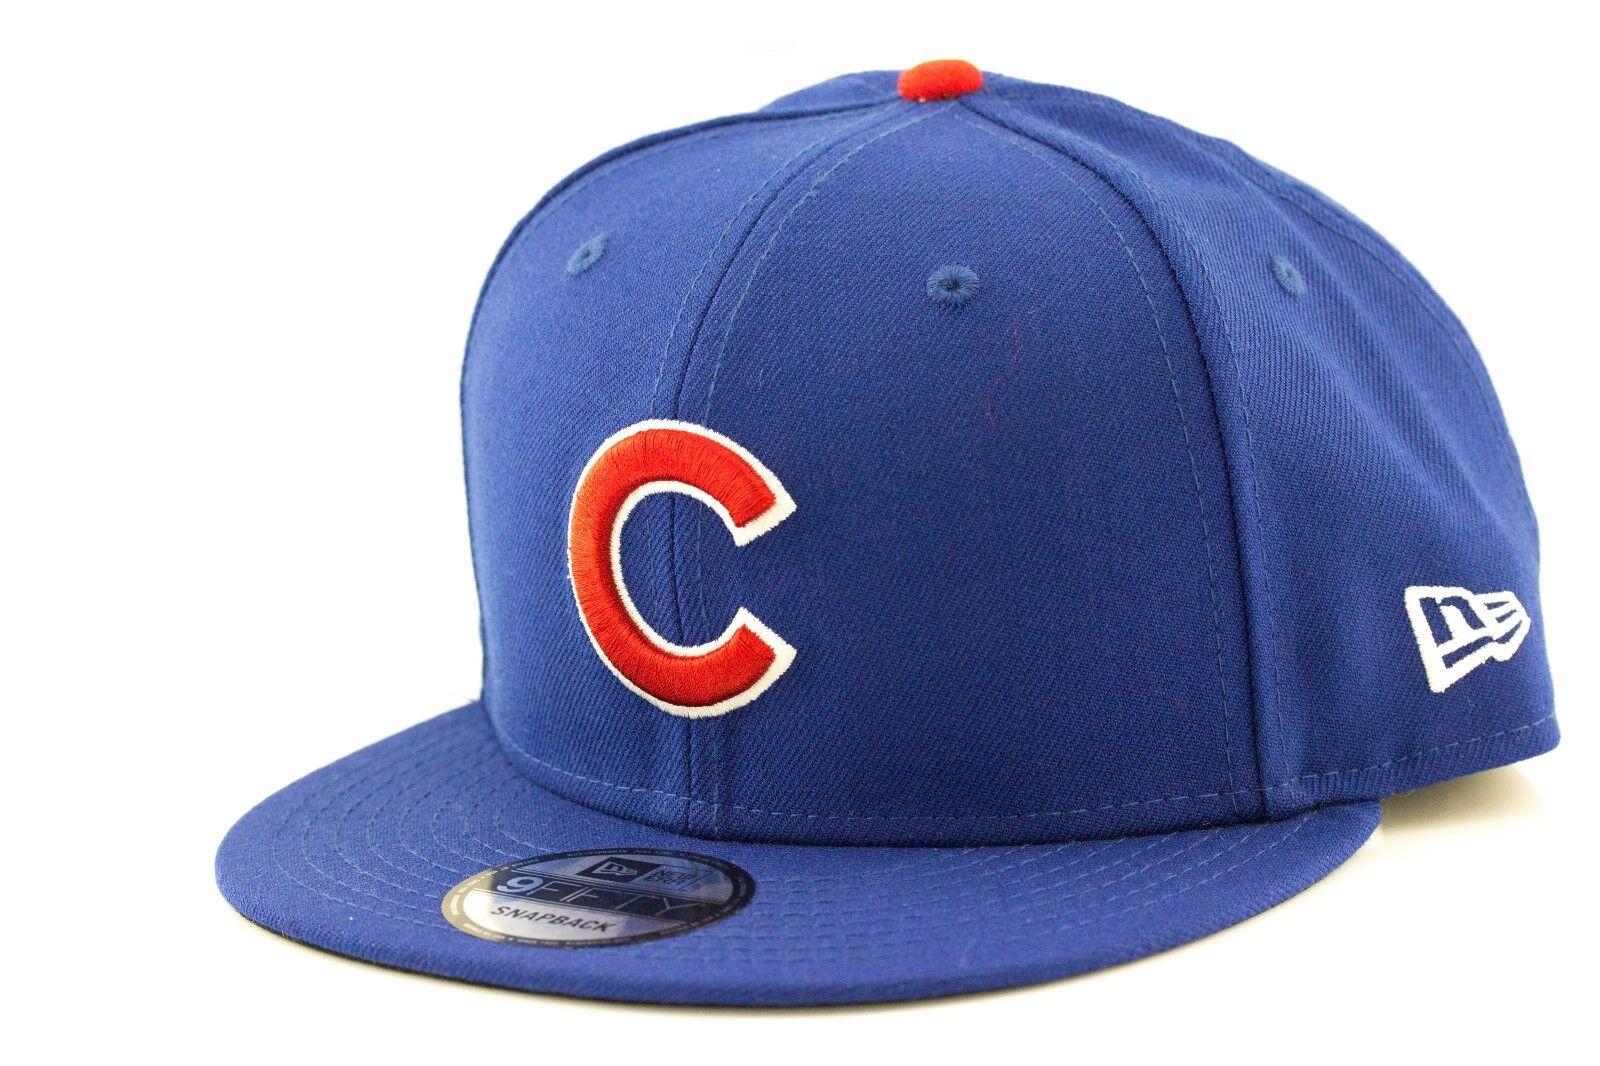 3e64634c8fe Chicago Cubs New Era MLB Team 9Fifty Snapback Hat Genuine Baseball Cap New  Era